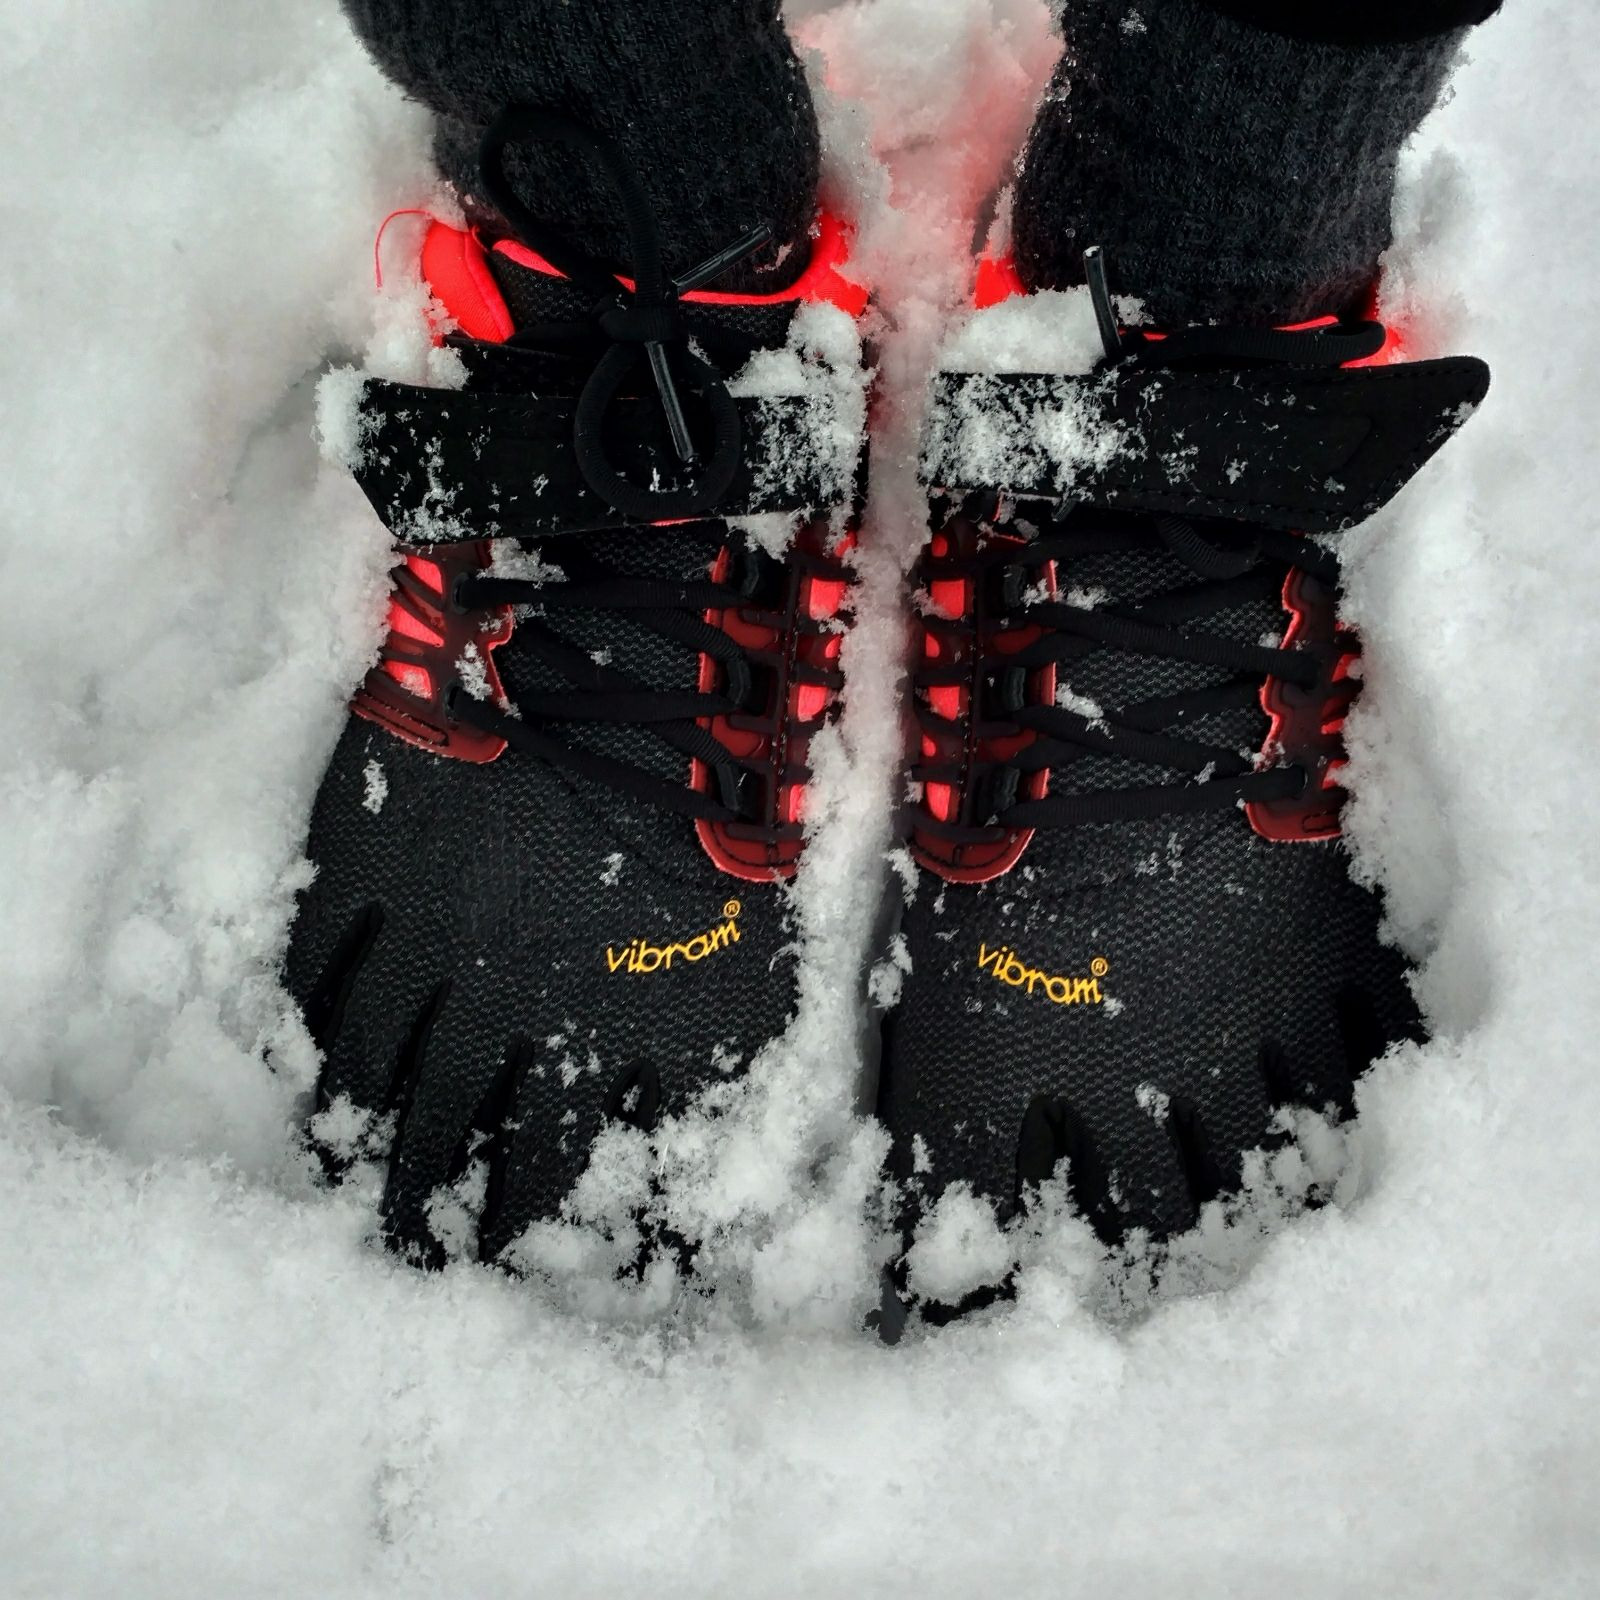 Vibram FiveFingers in the snow | V-Train is pretty winterproof